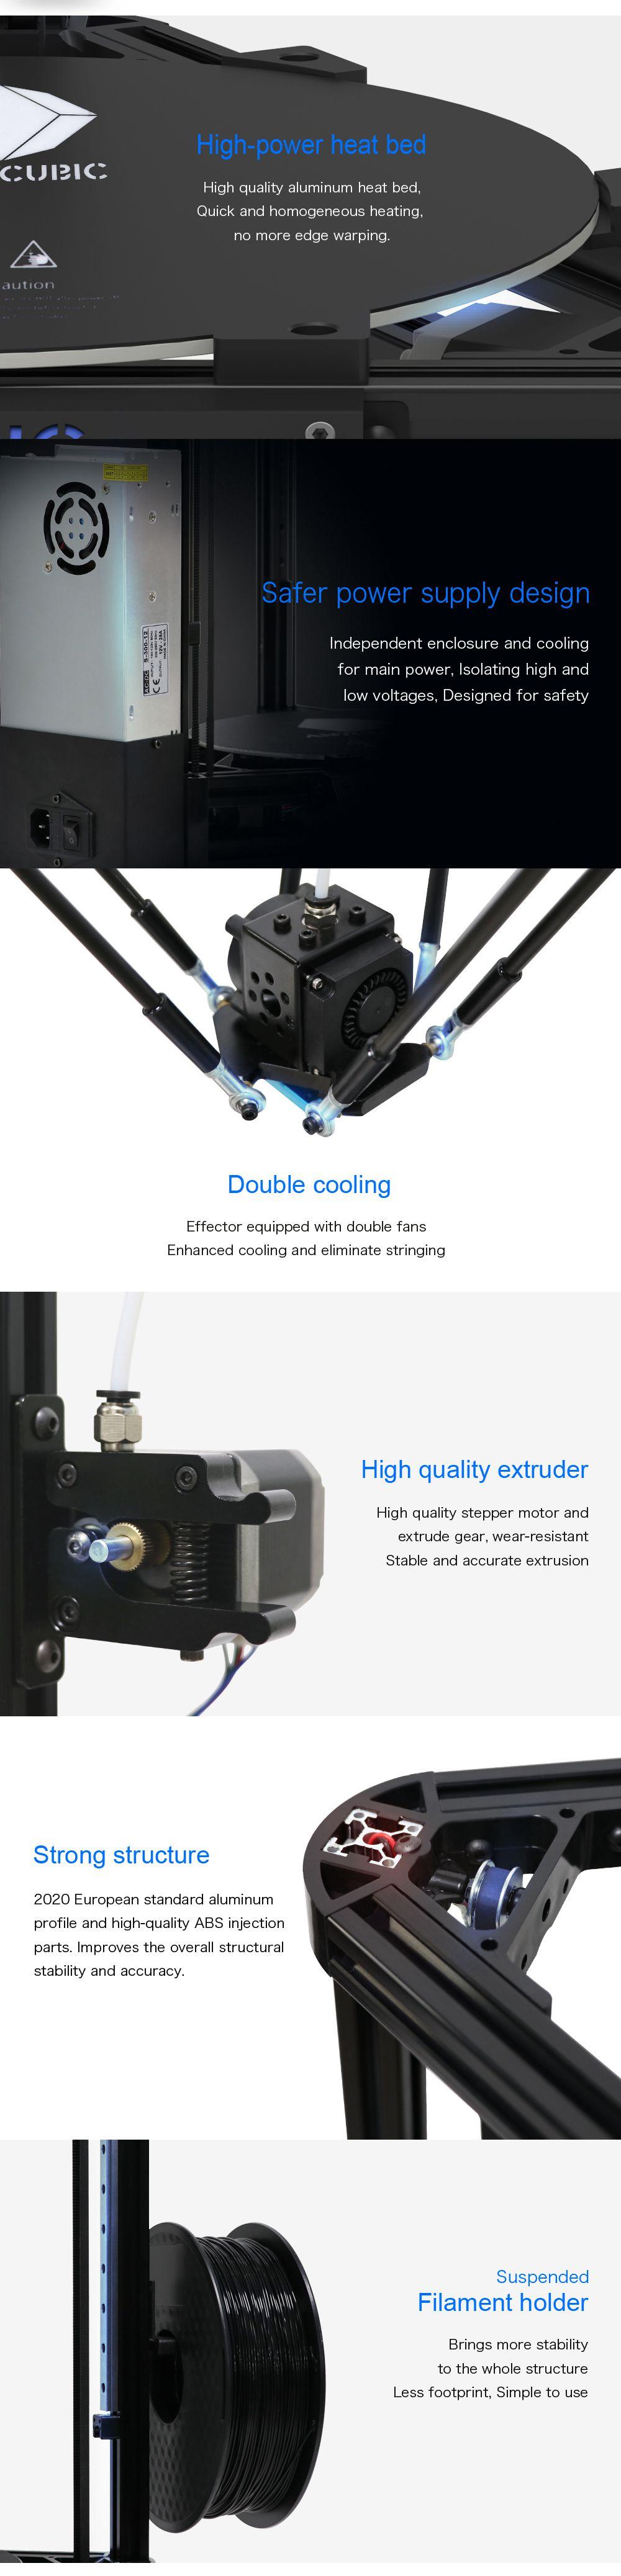 ANYCUBIC 3D Printer Impressora